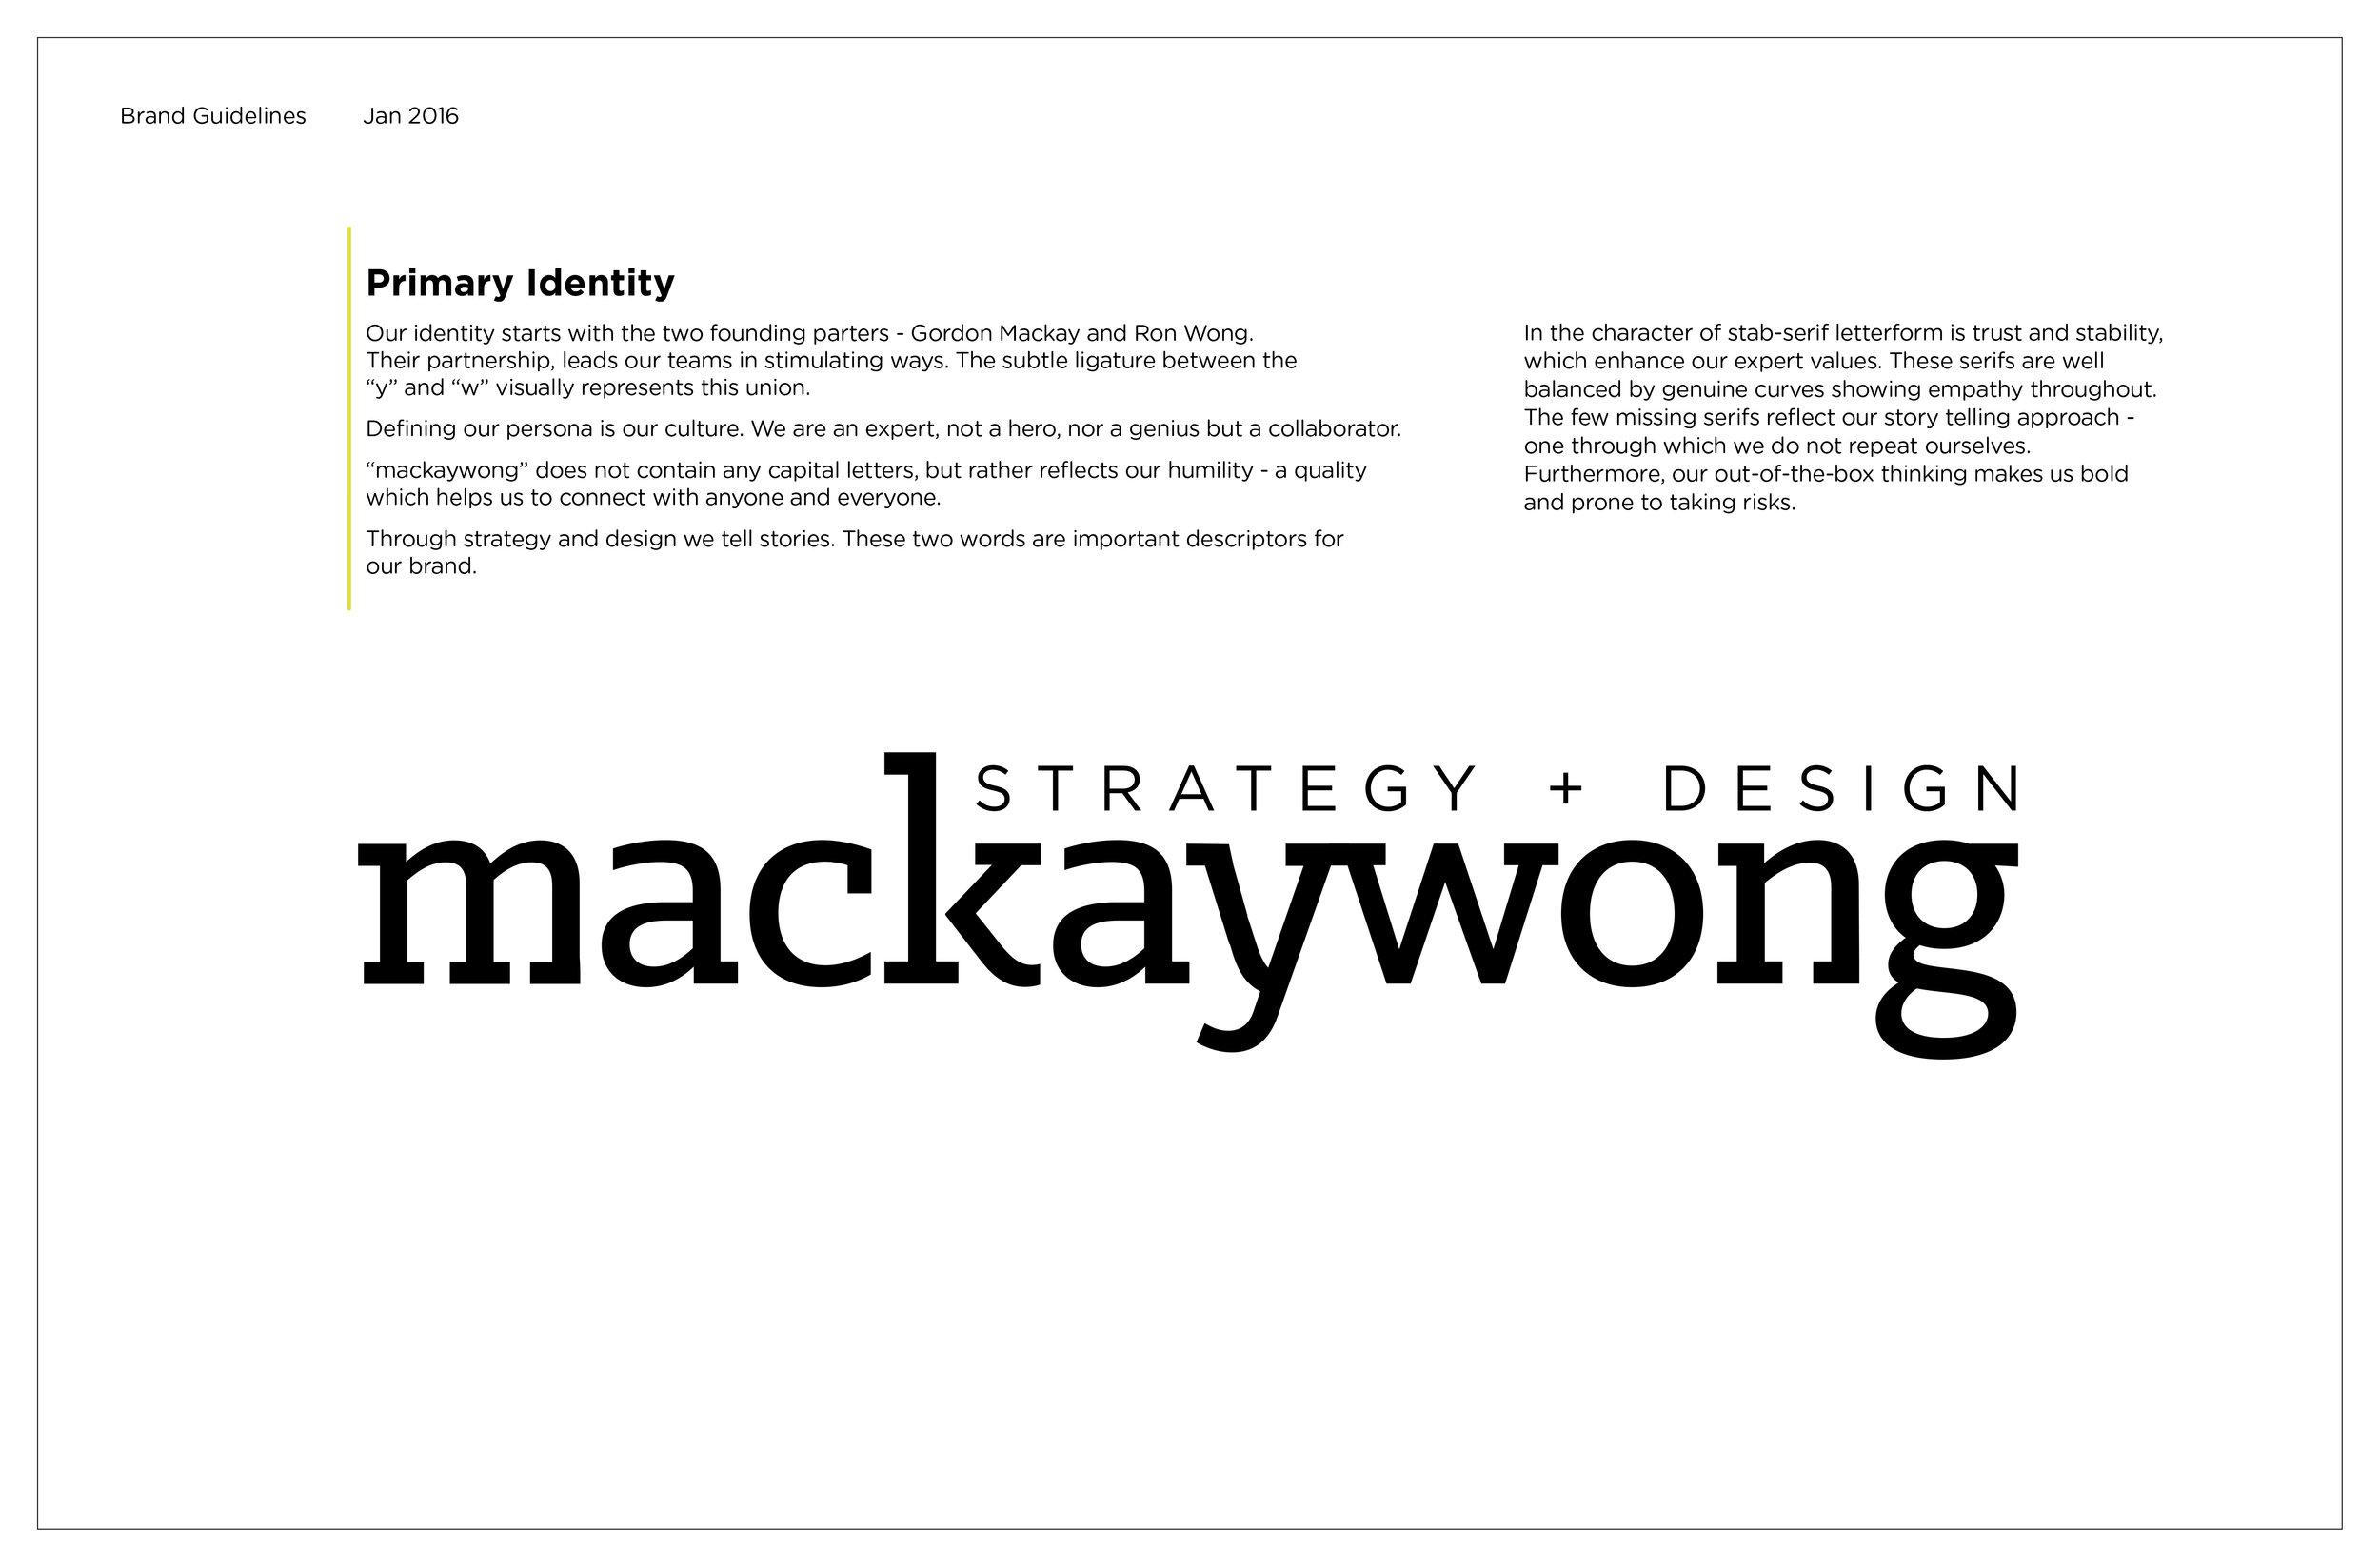 MW new brandstandards_logo-01.jpg